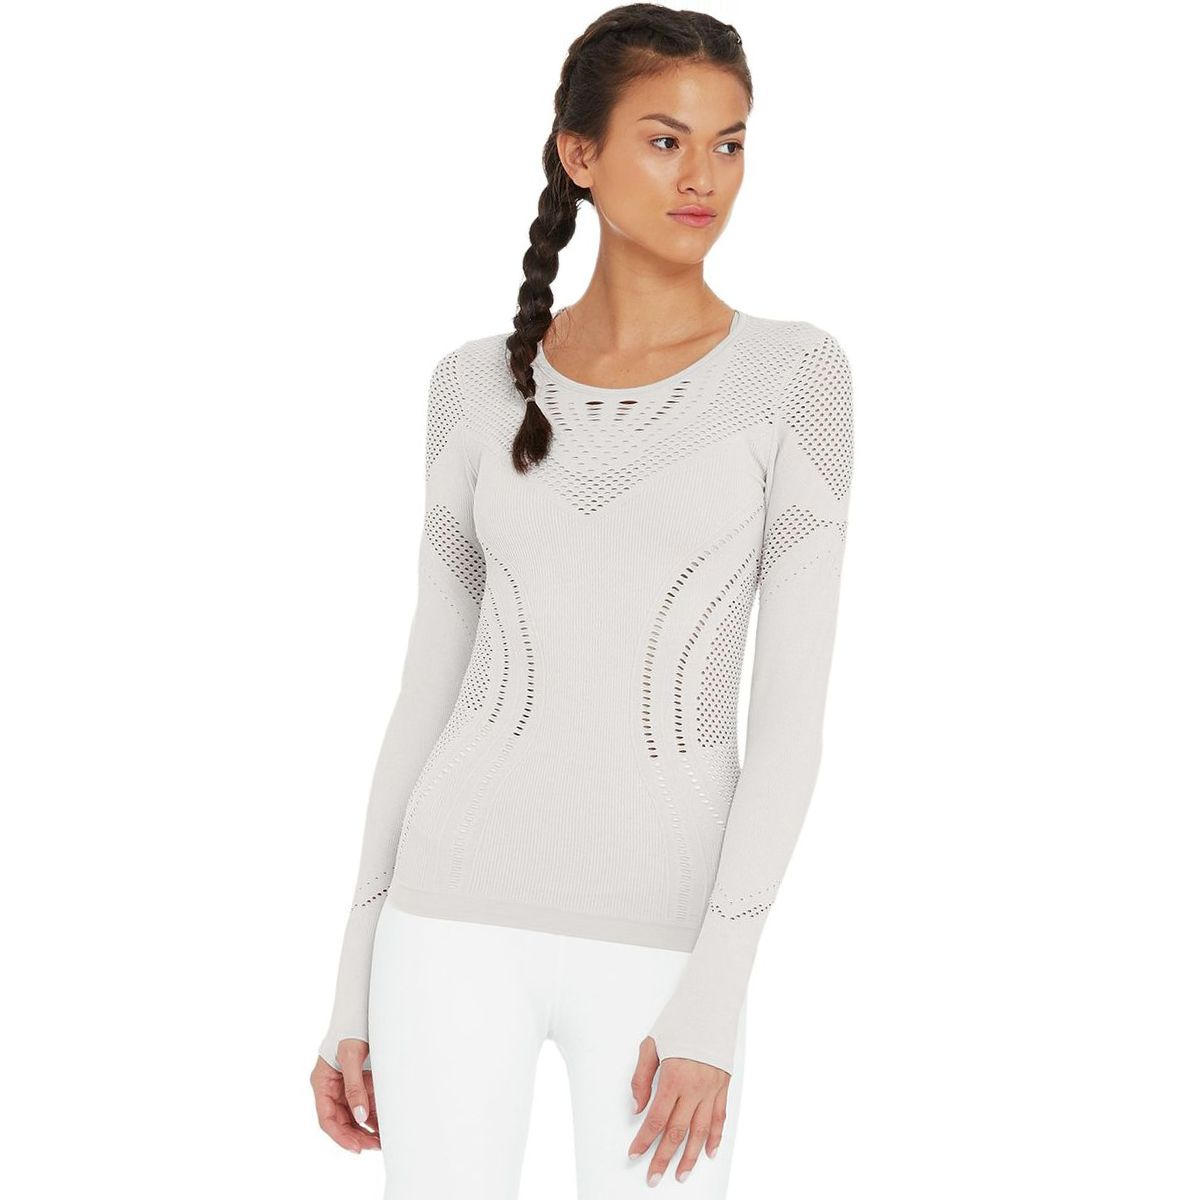 Alo Yoga Lark Long-Sleeve Shirt - Women's